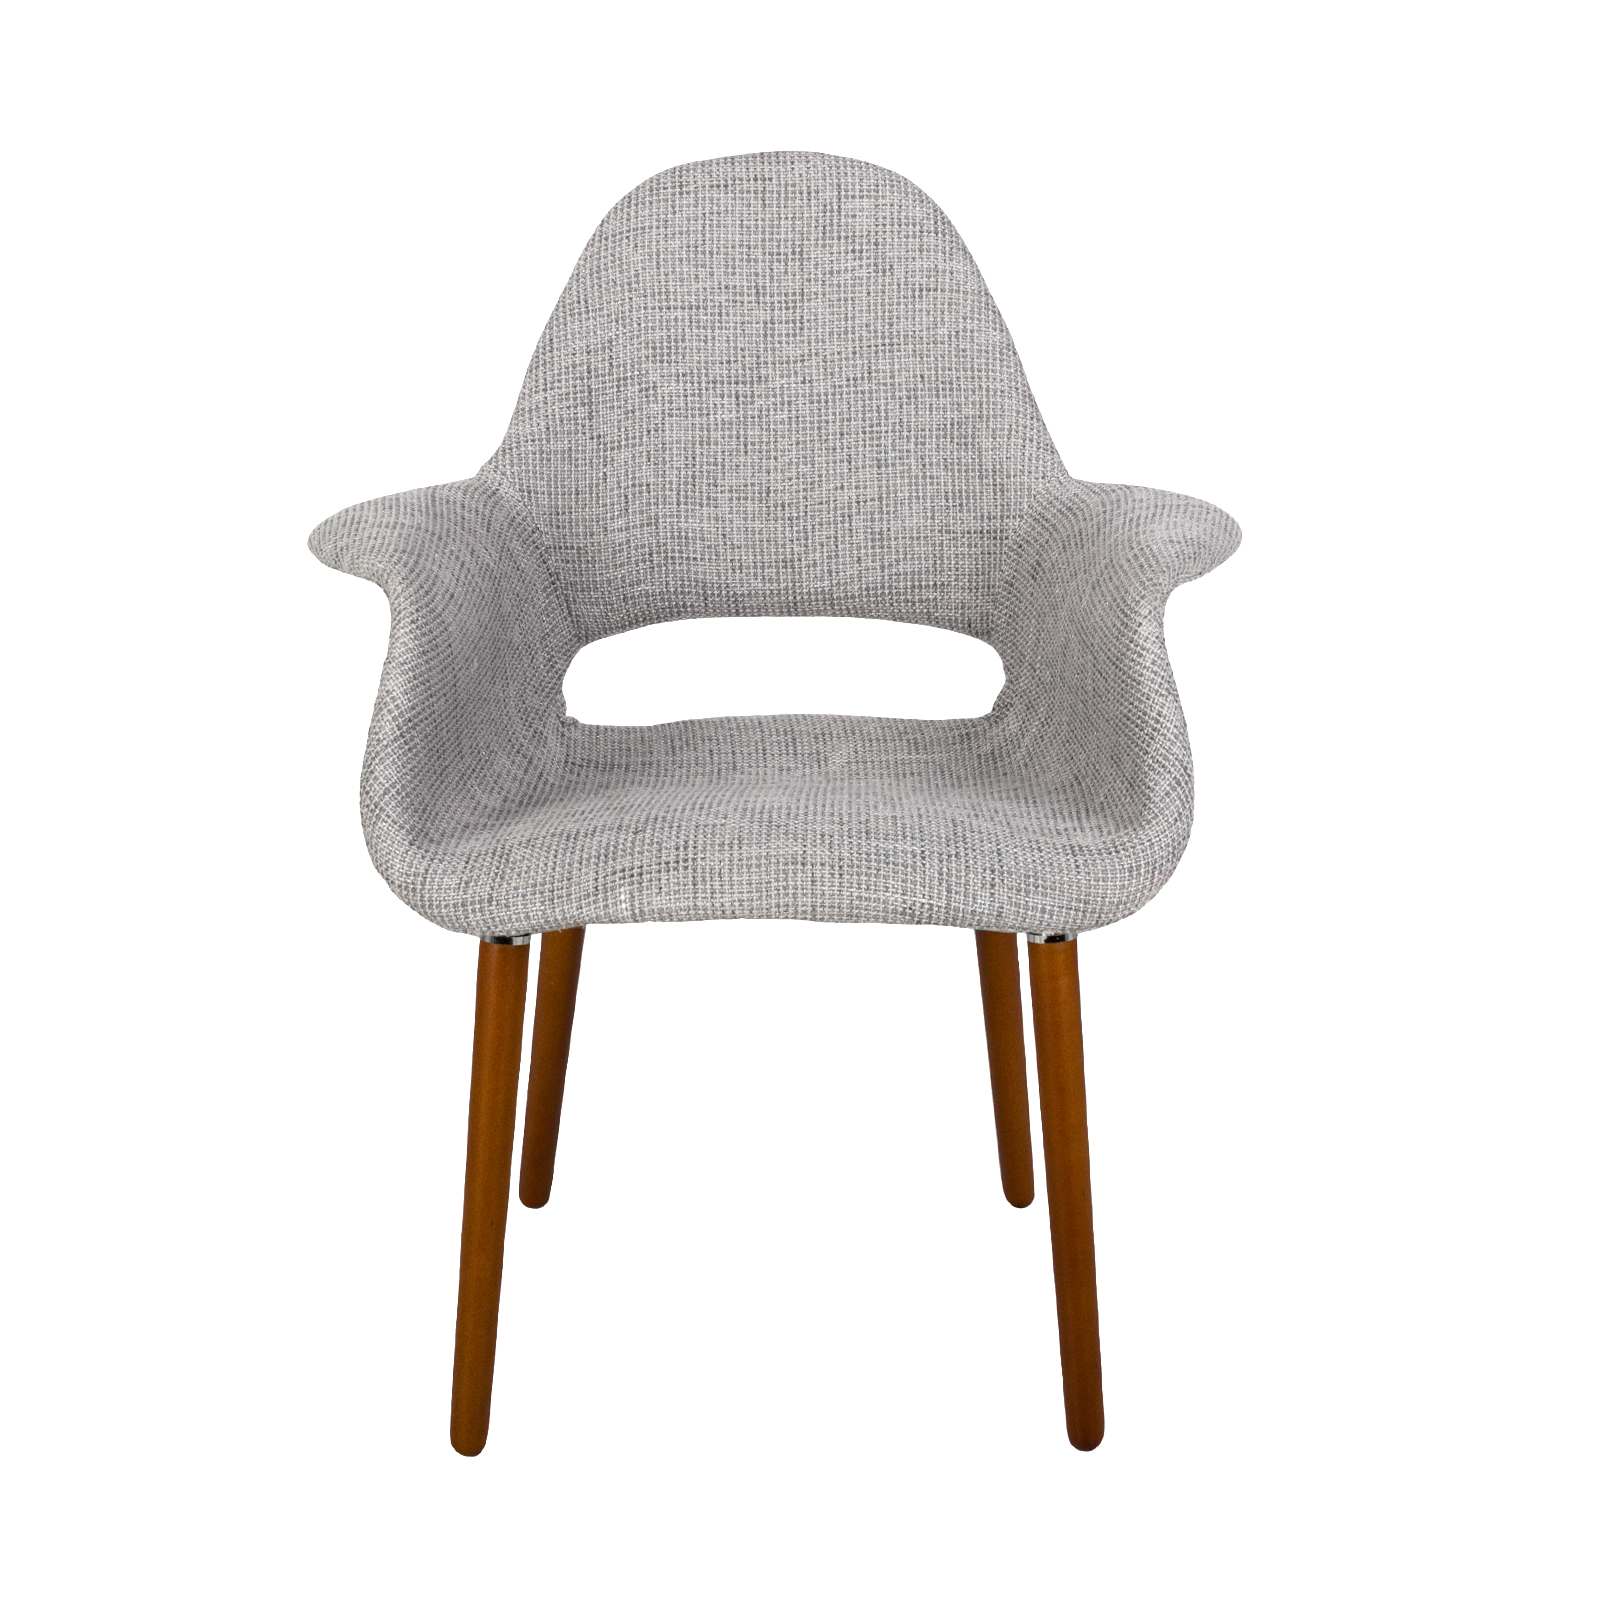 Organic Armchair 28 Images Eames Saarinen Style Brown